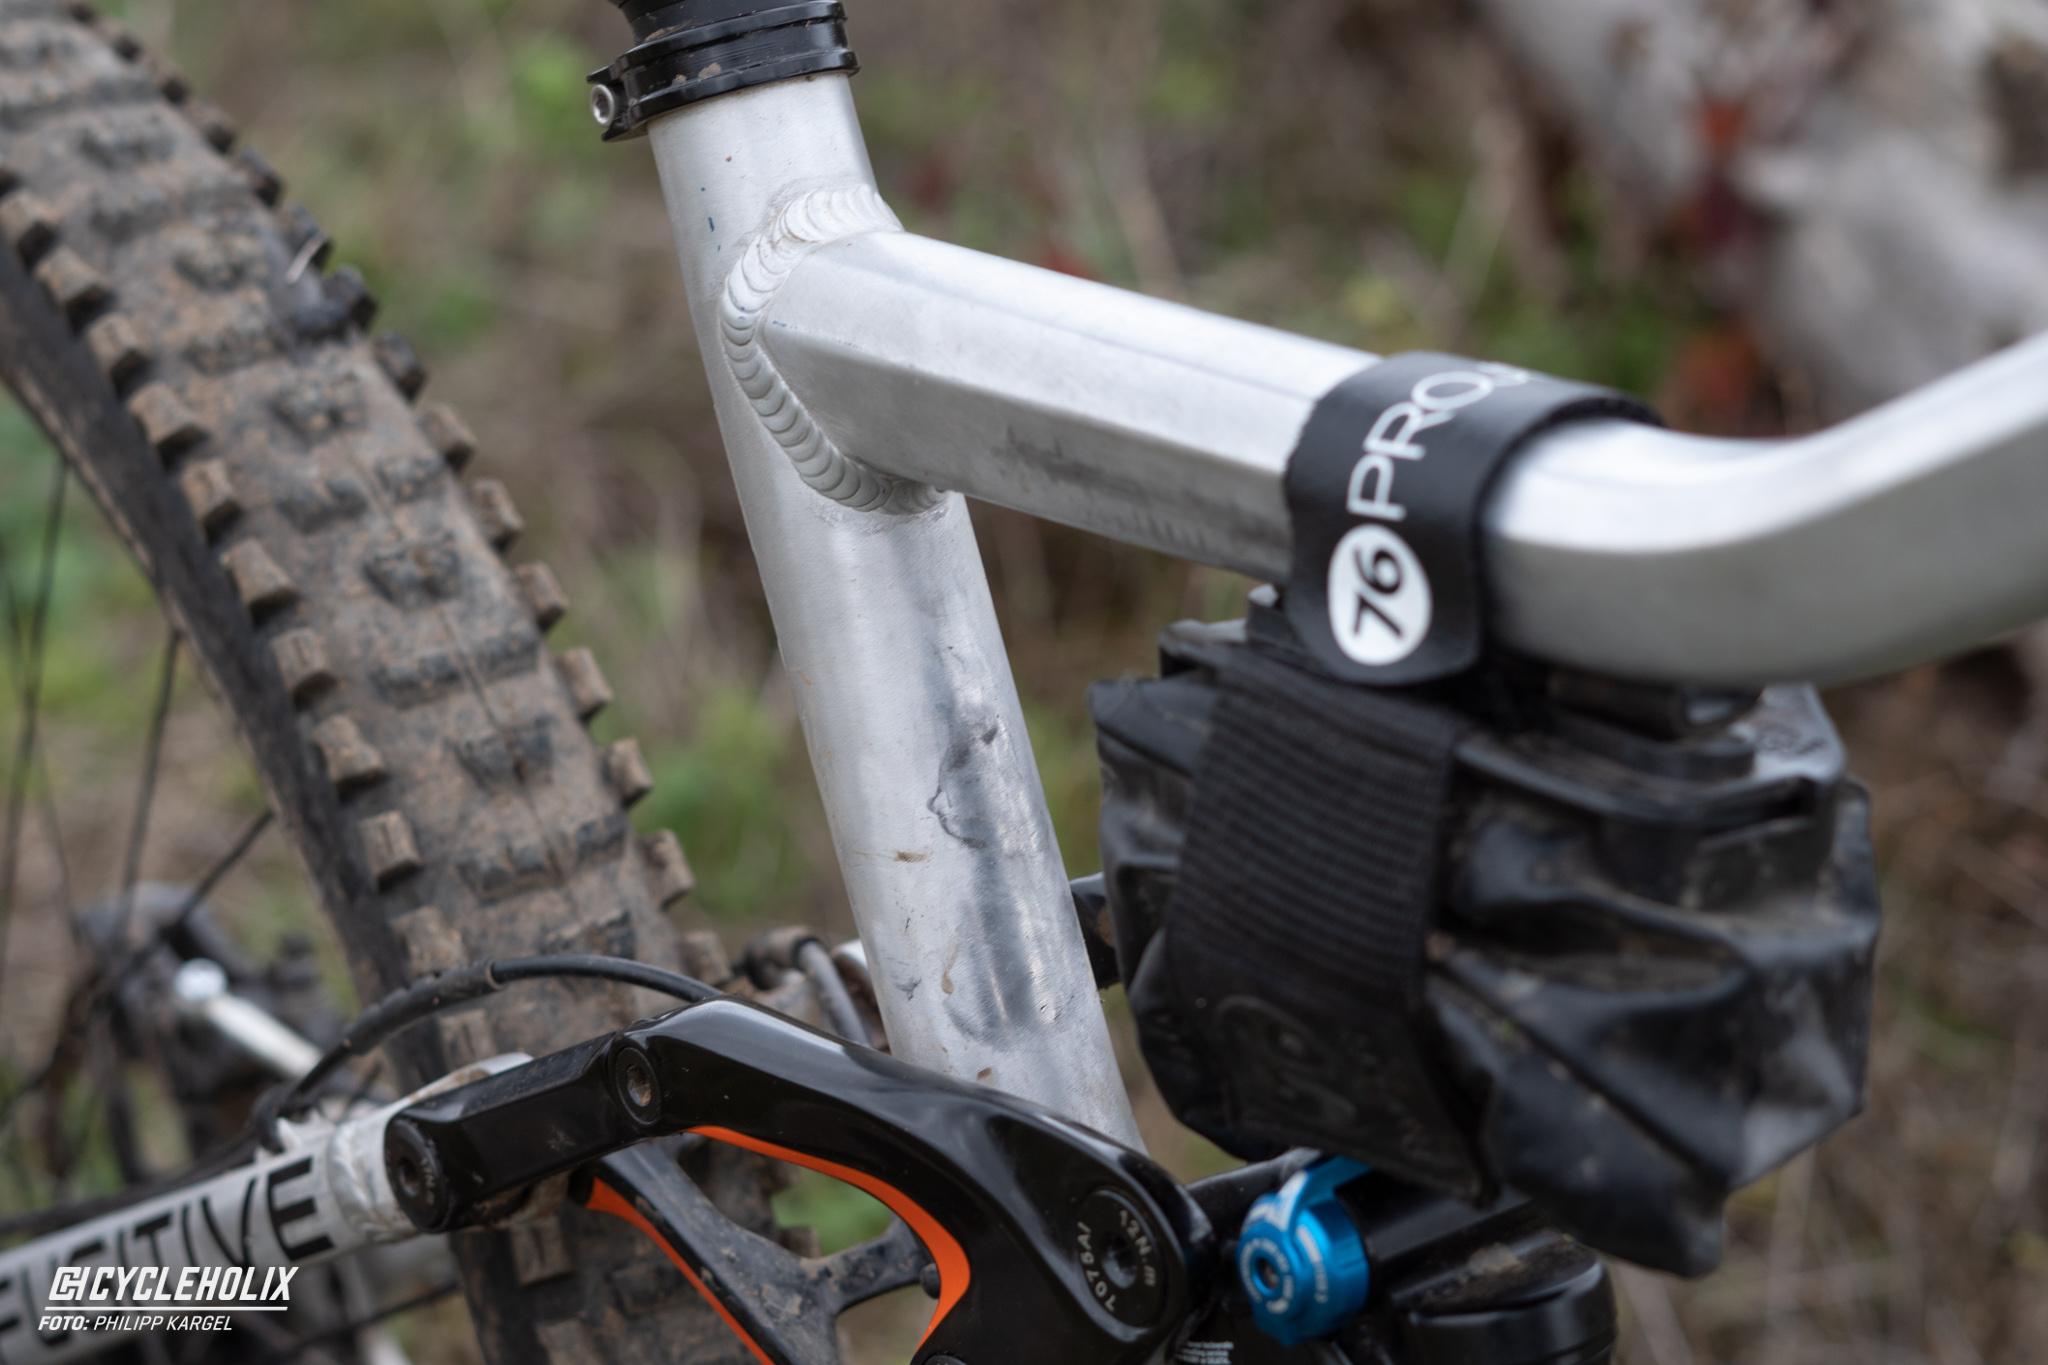 PK102381 Cycleholix